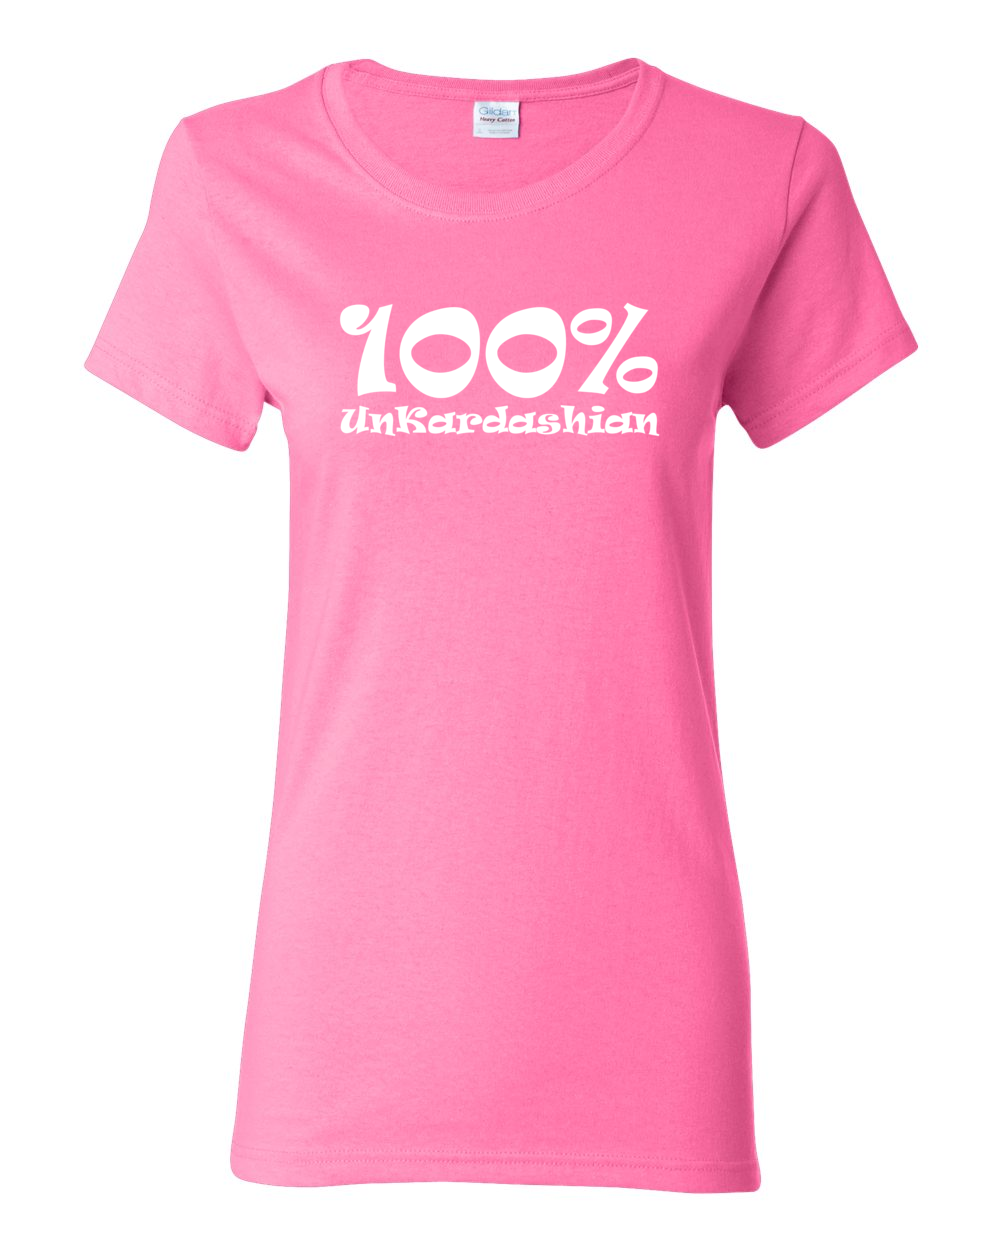 100% UnKardashian